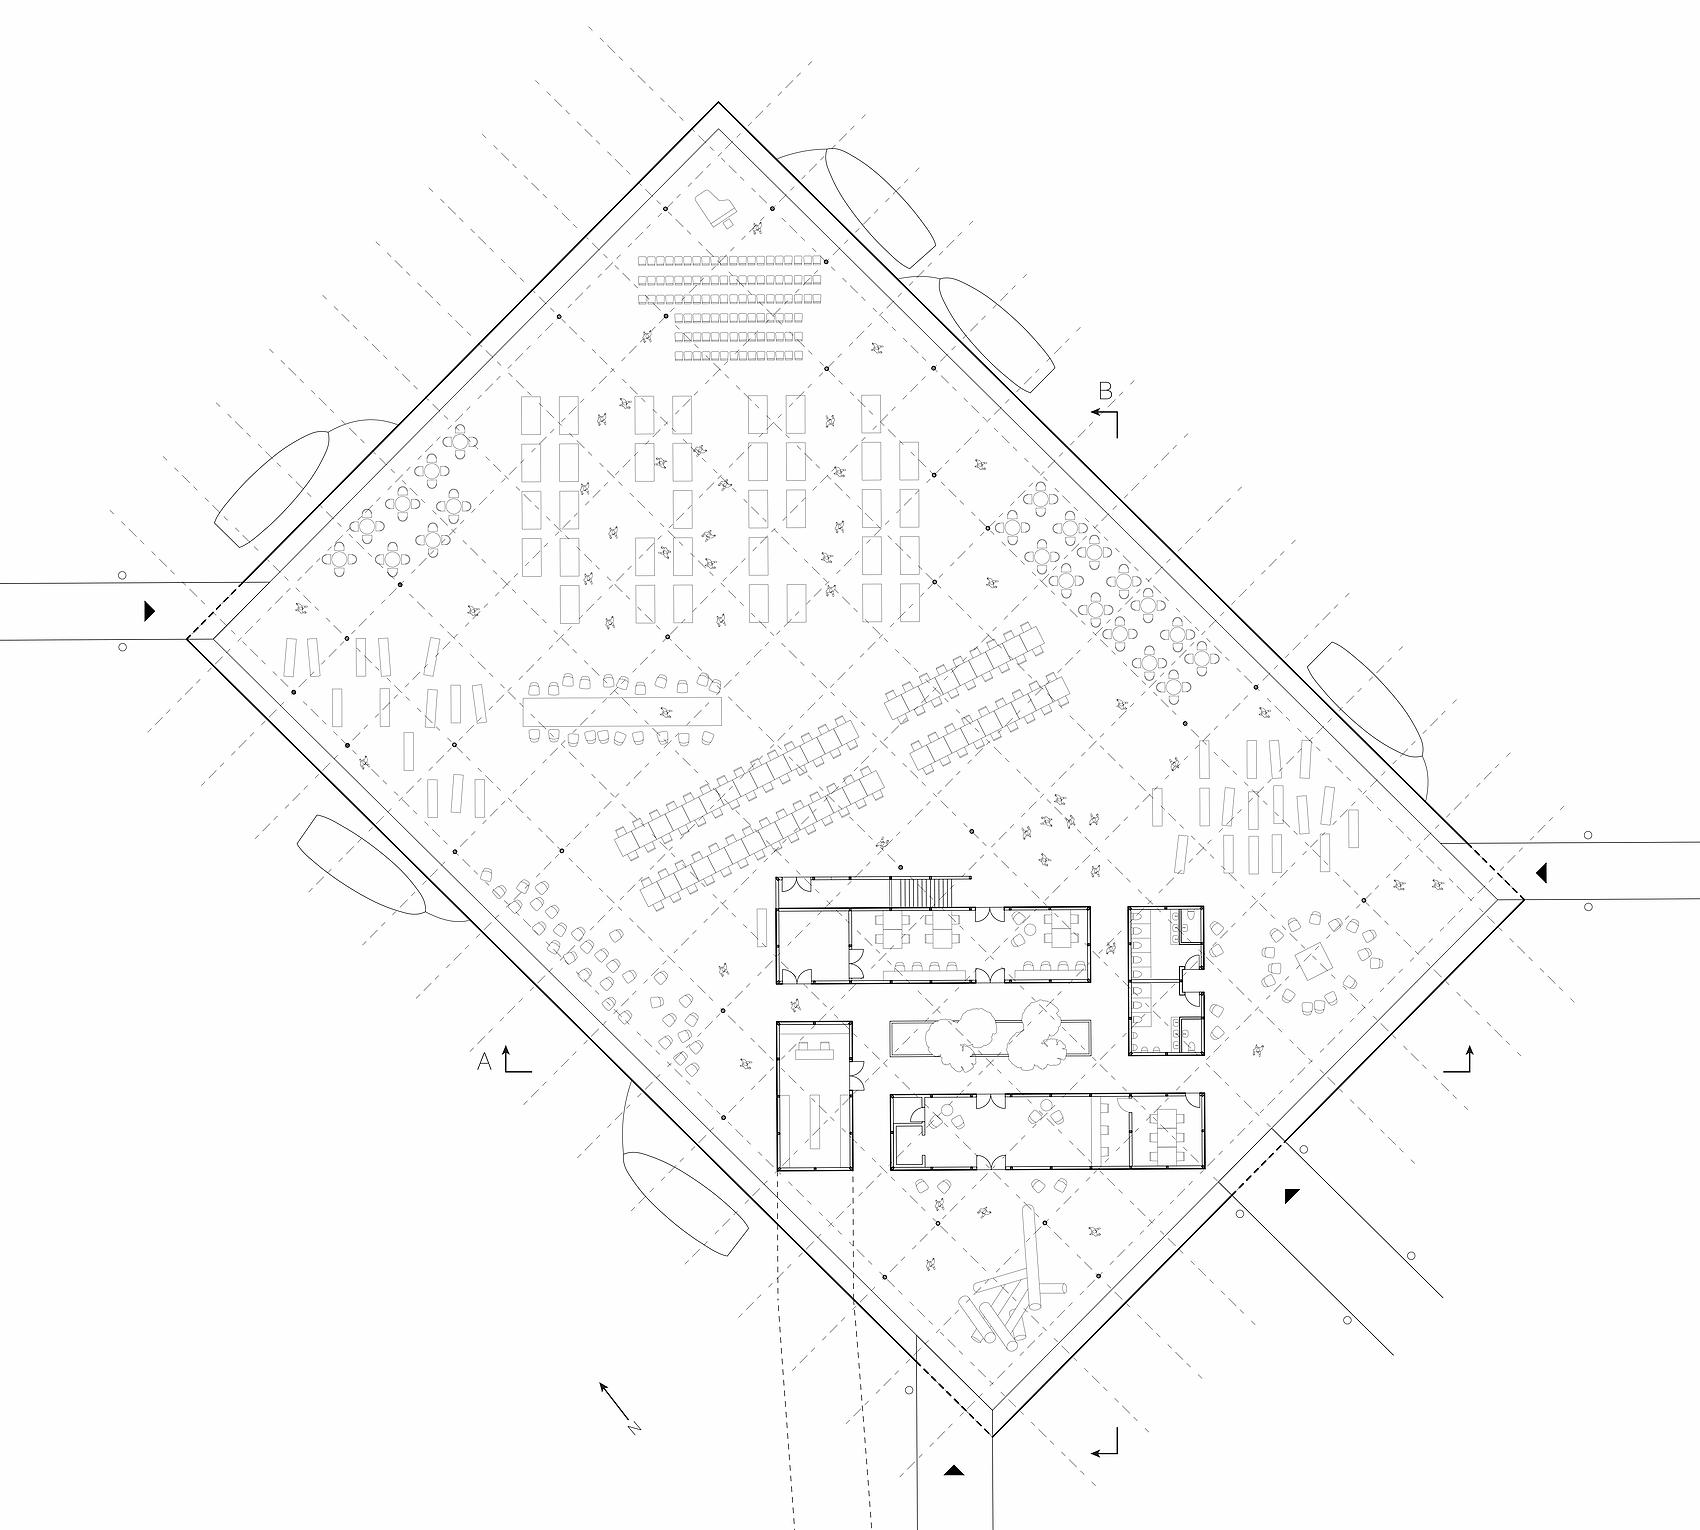 Koozarch Jaytsai 1 Architectural Floor Plans Plan Sketch Technical Drawing